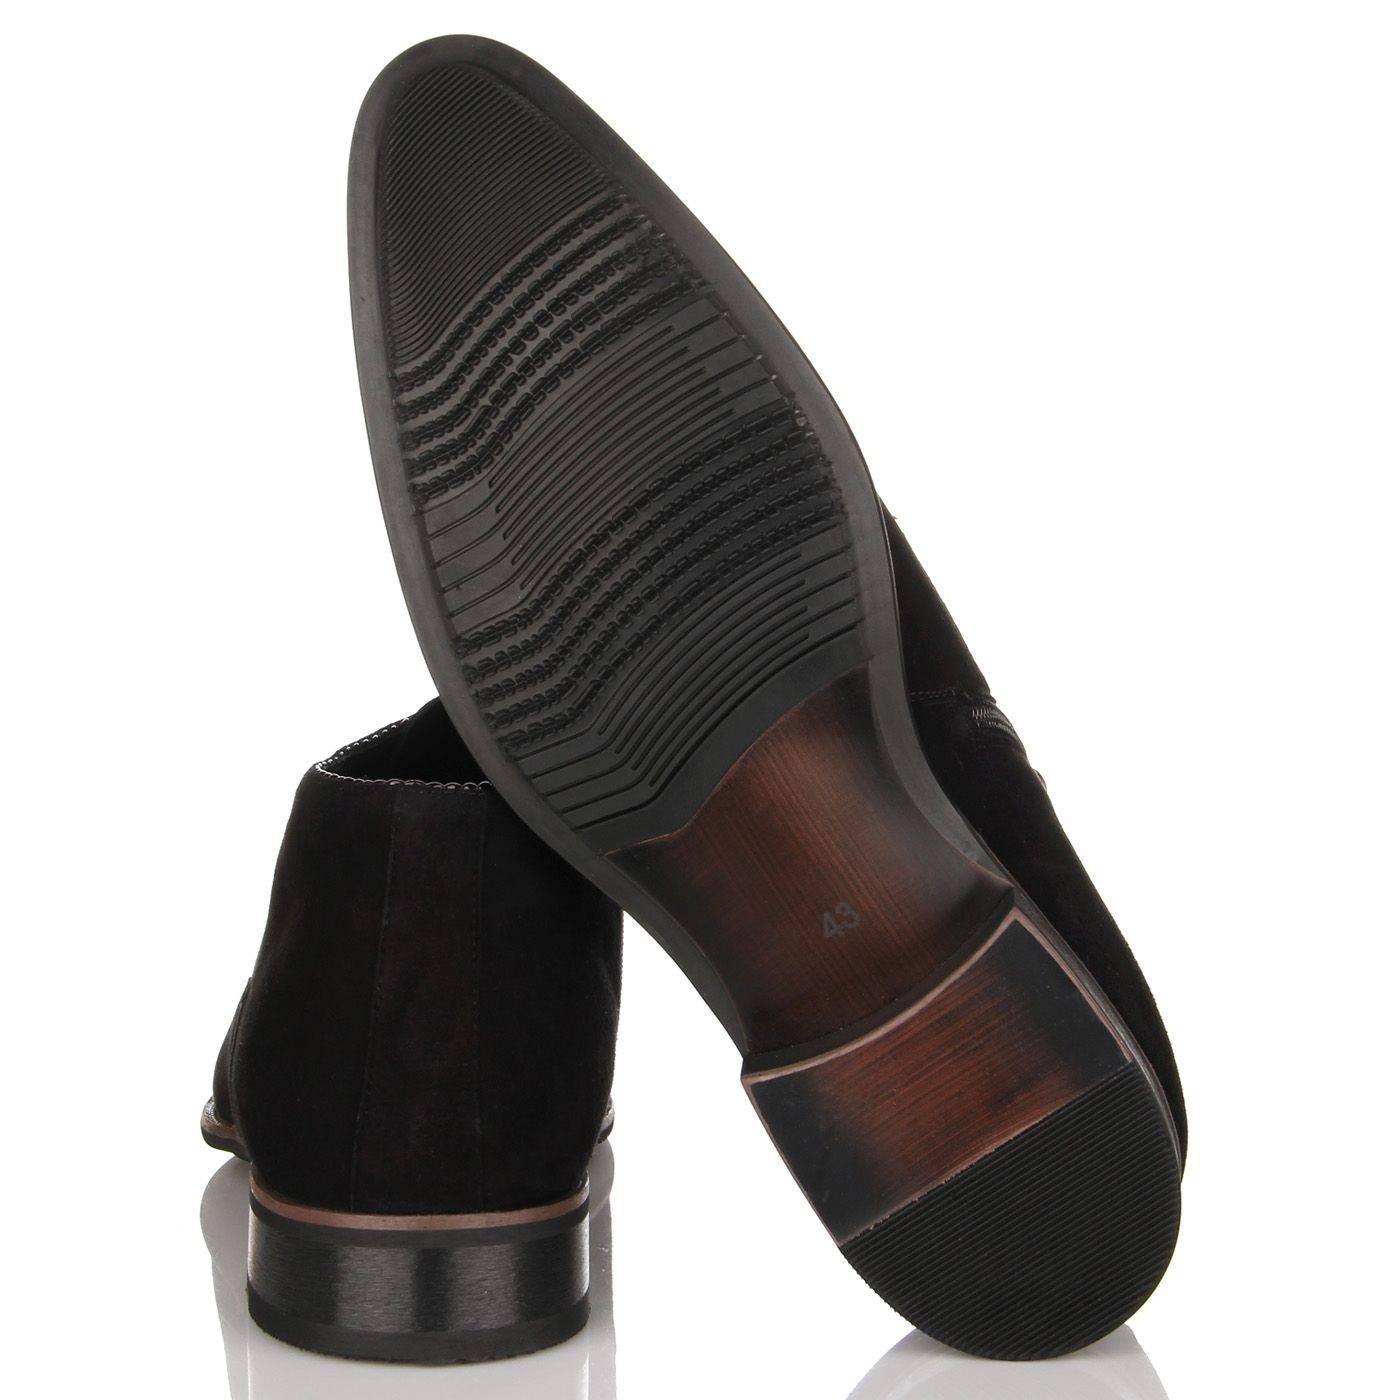 c8099129a911d2 Черевики чоловічі Boticheli 2821 Чорний купить по выгодной цене в ...